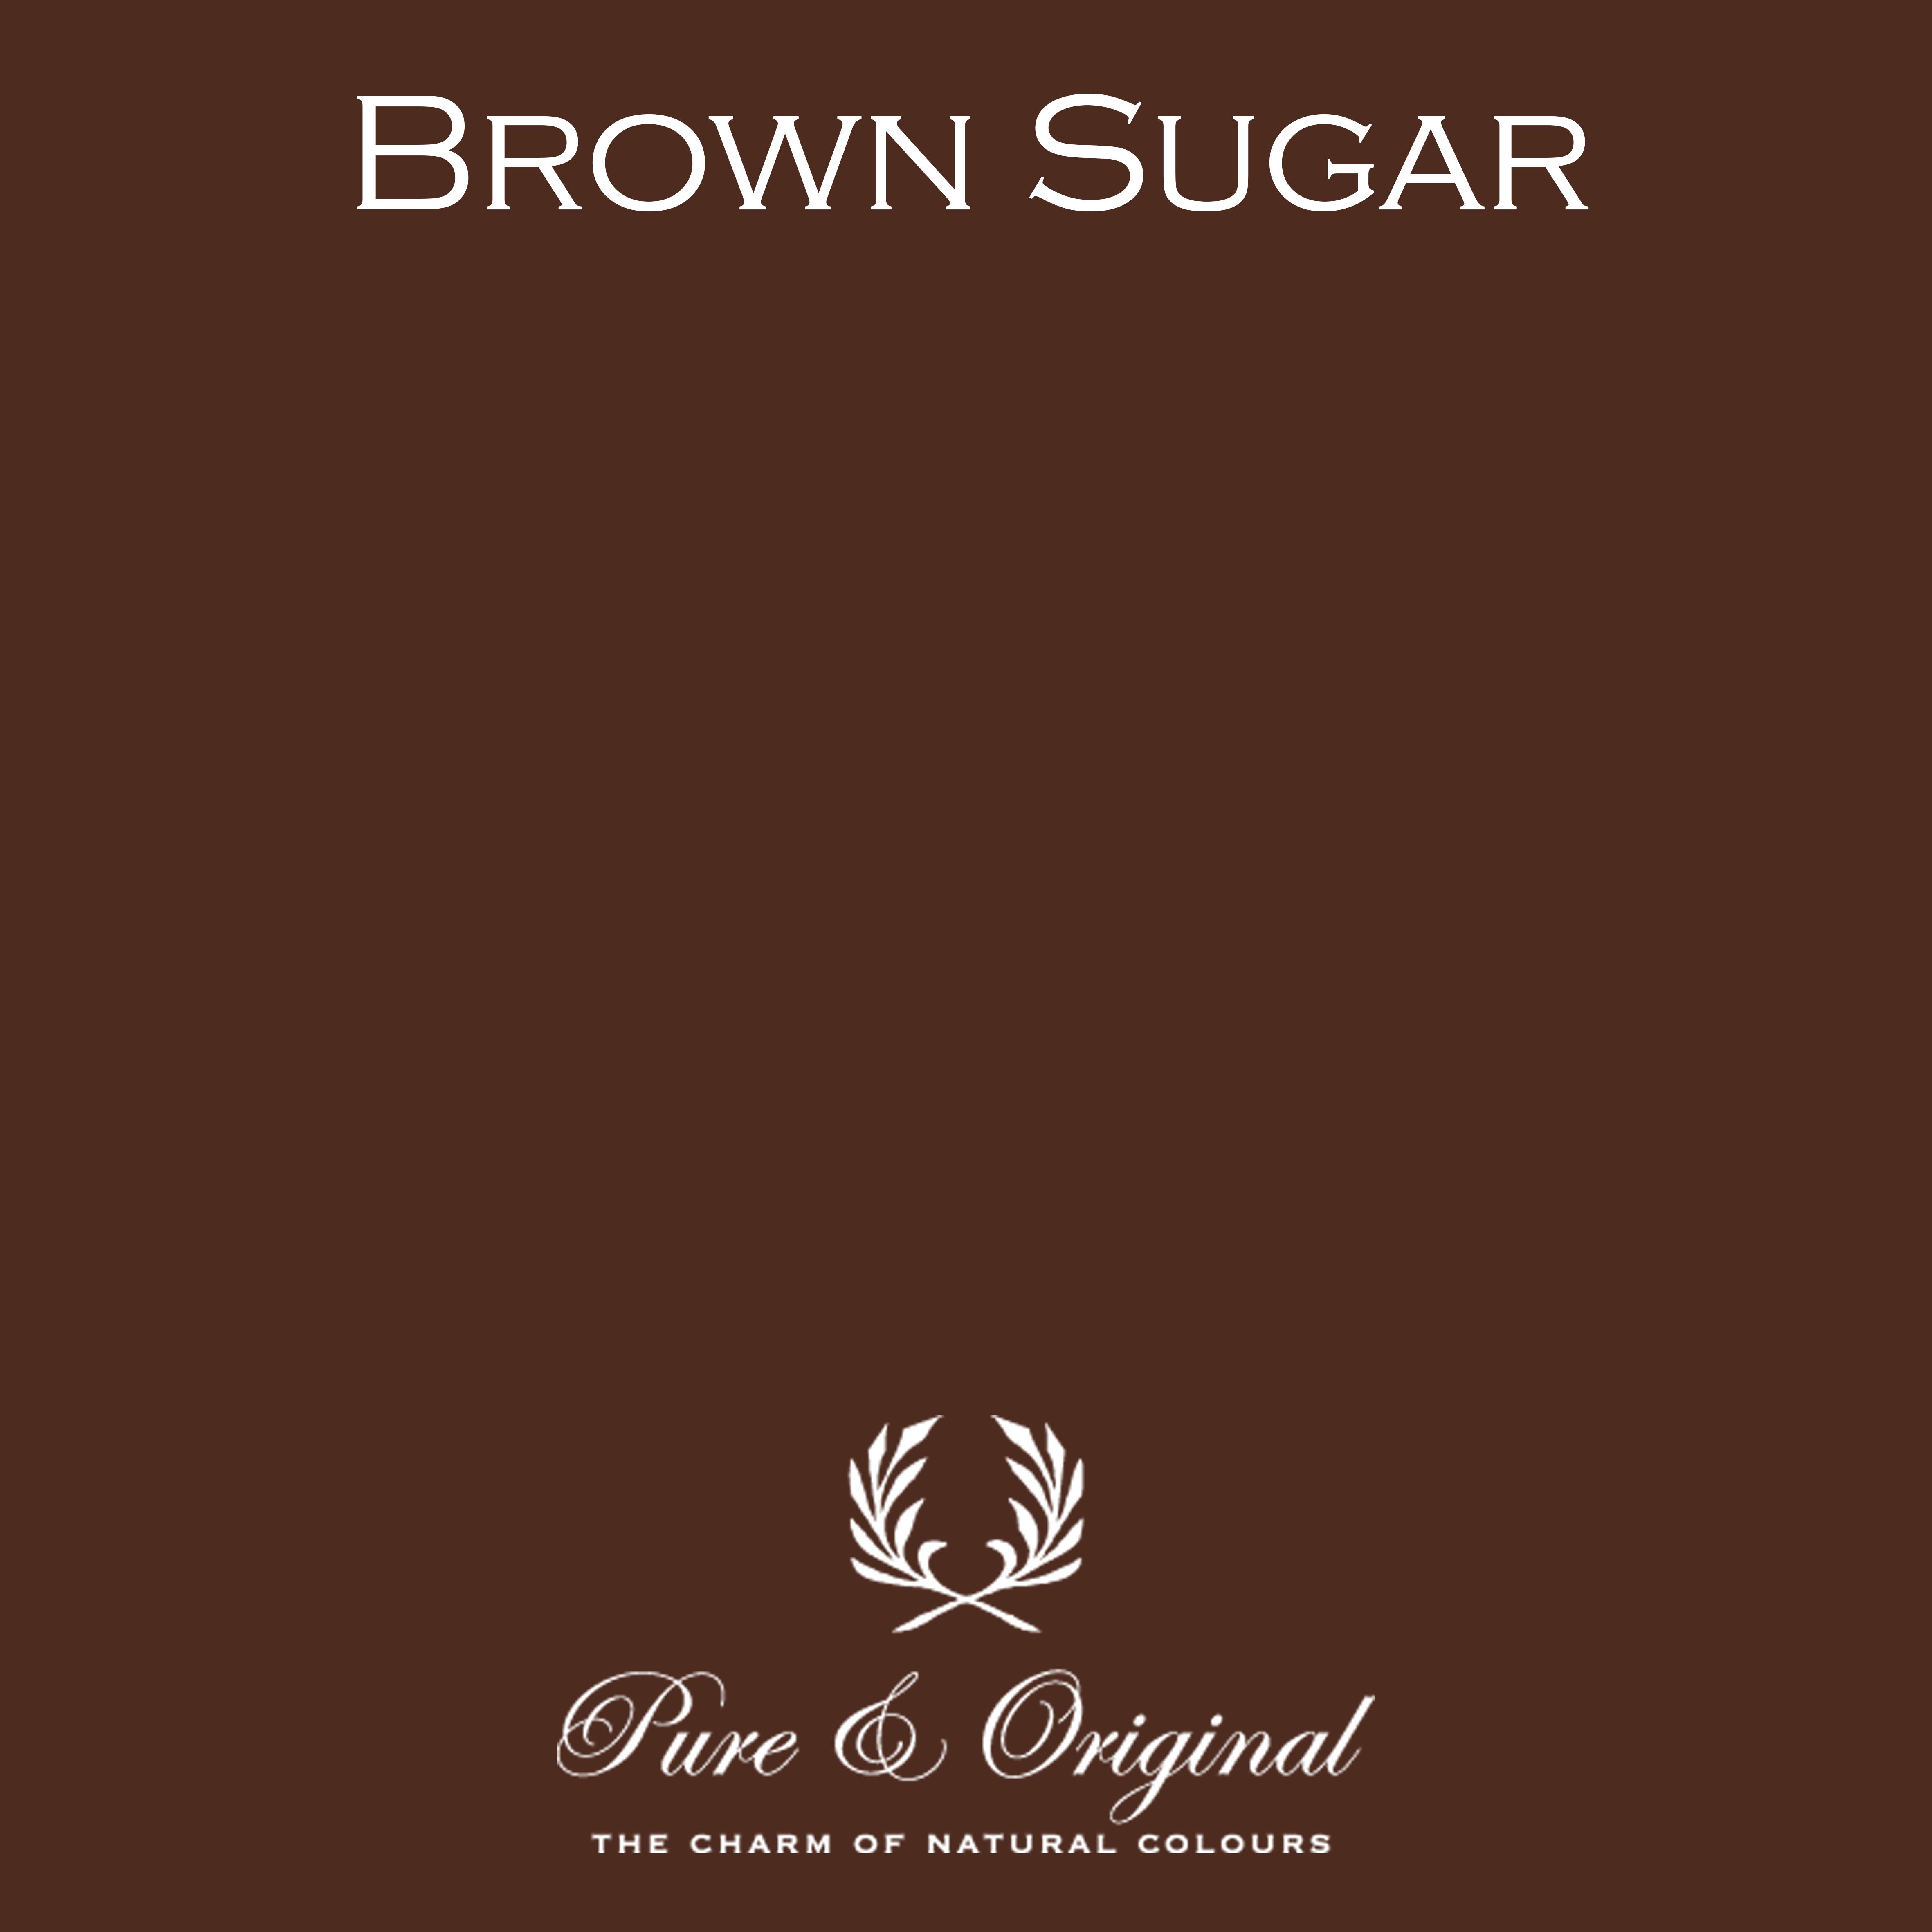 Kulör Brown Sugar, Classico kritfärg